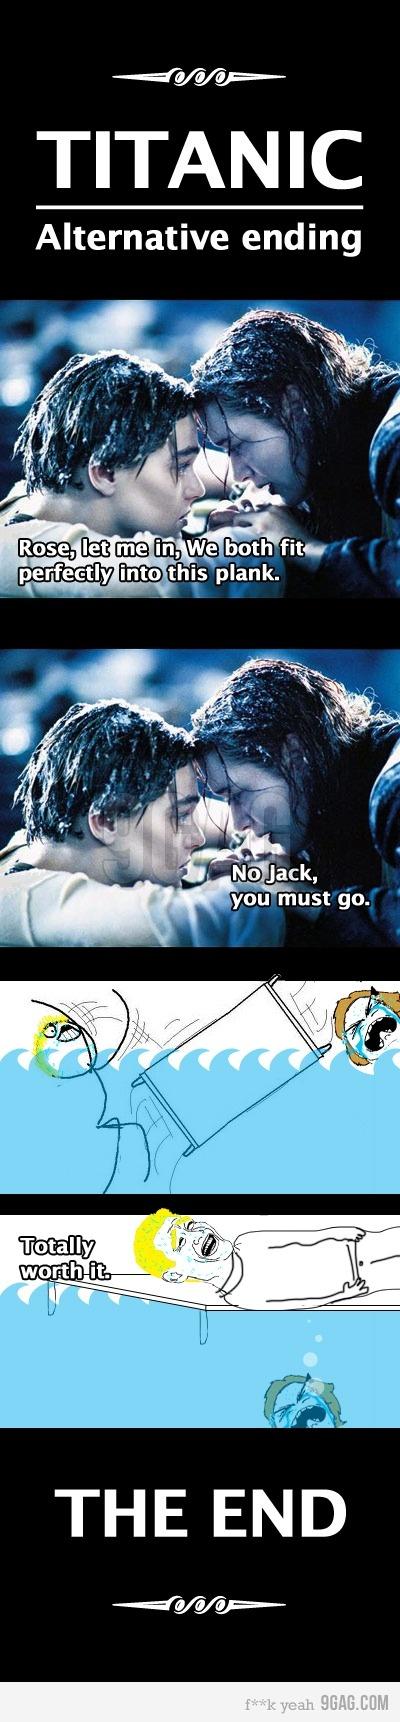 lmbo: Funny Pics, Funny Pictures, Lmfao Funny, Alternative, Funny Stuff, Funny Photo, Titanic Movie Funny, So Funny, Funny Memes